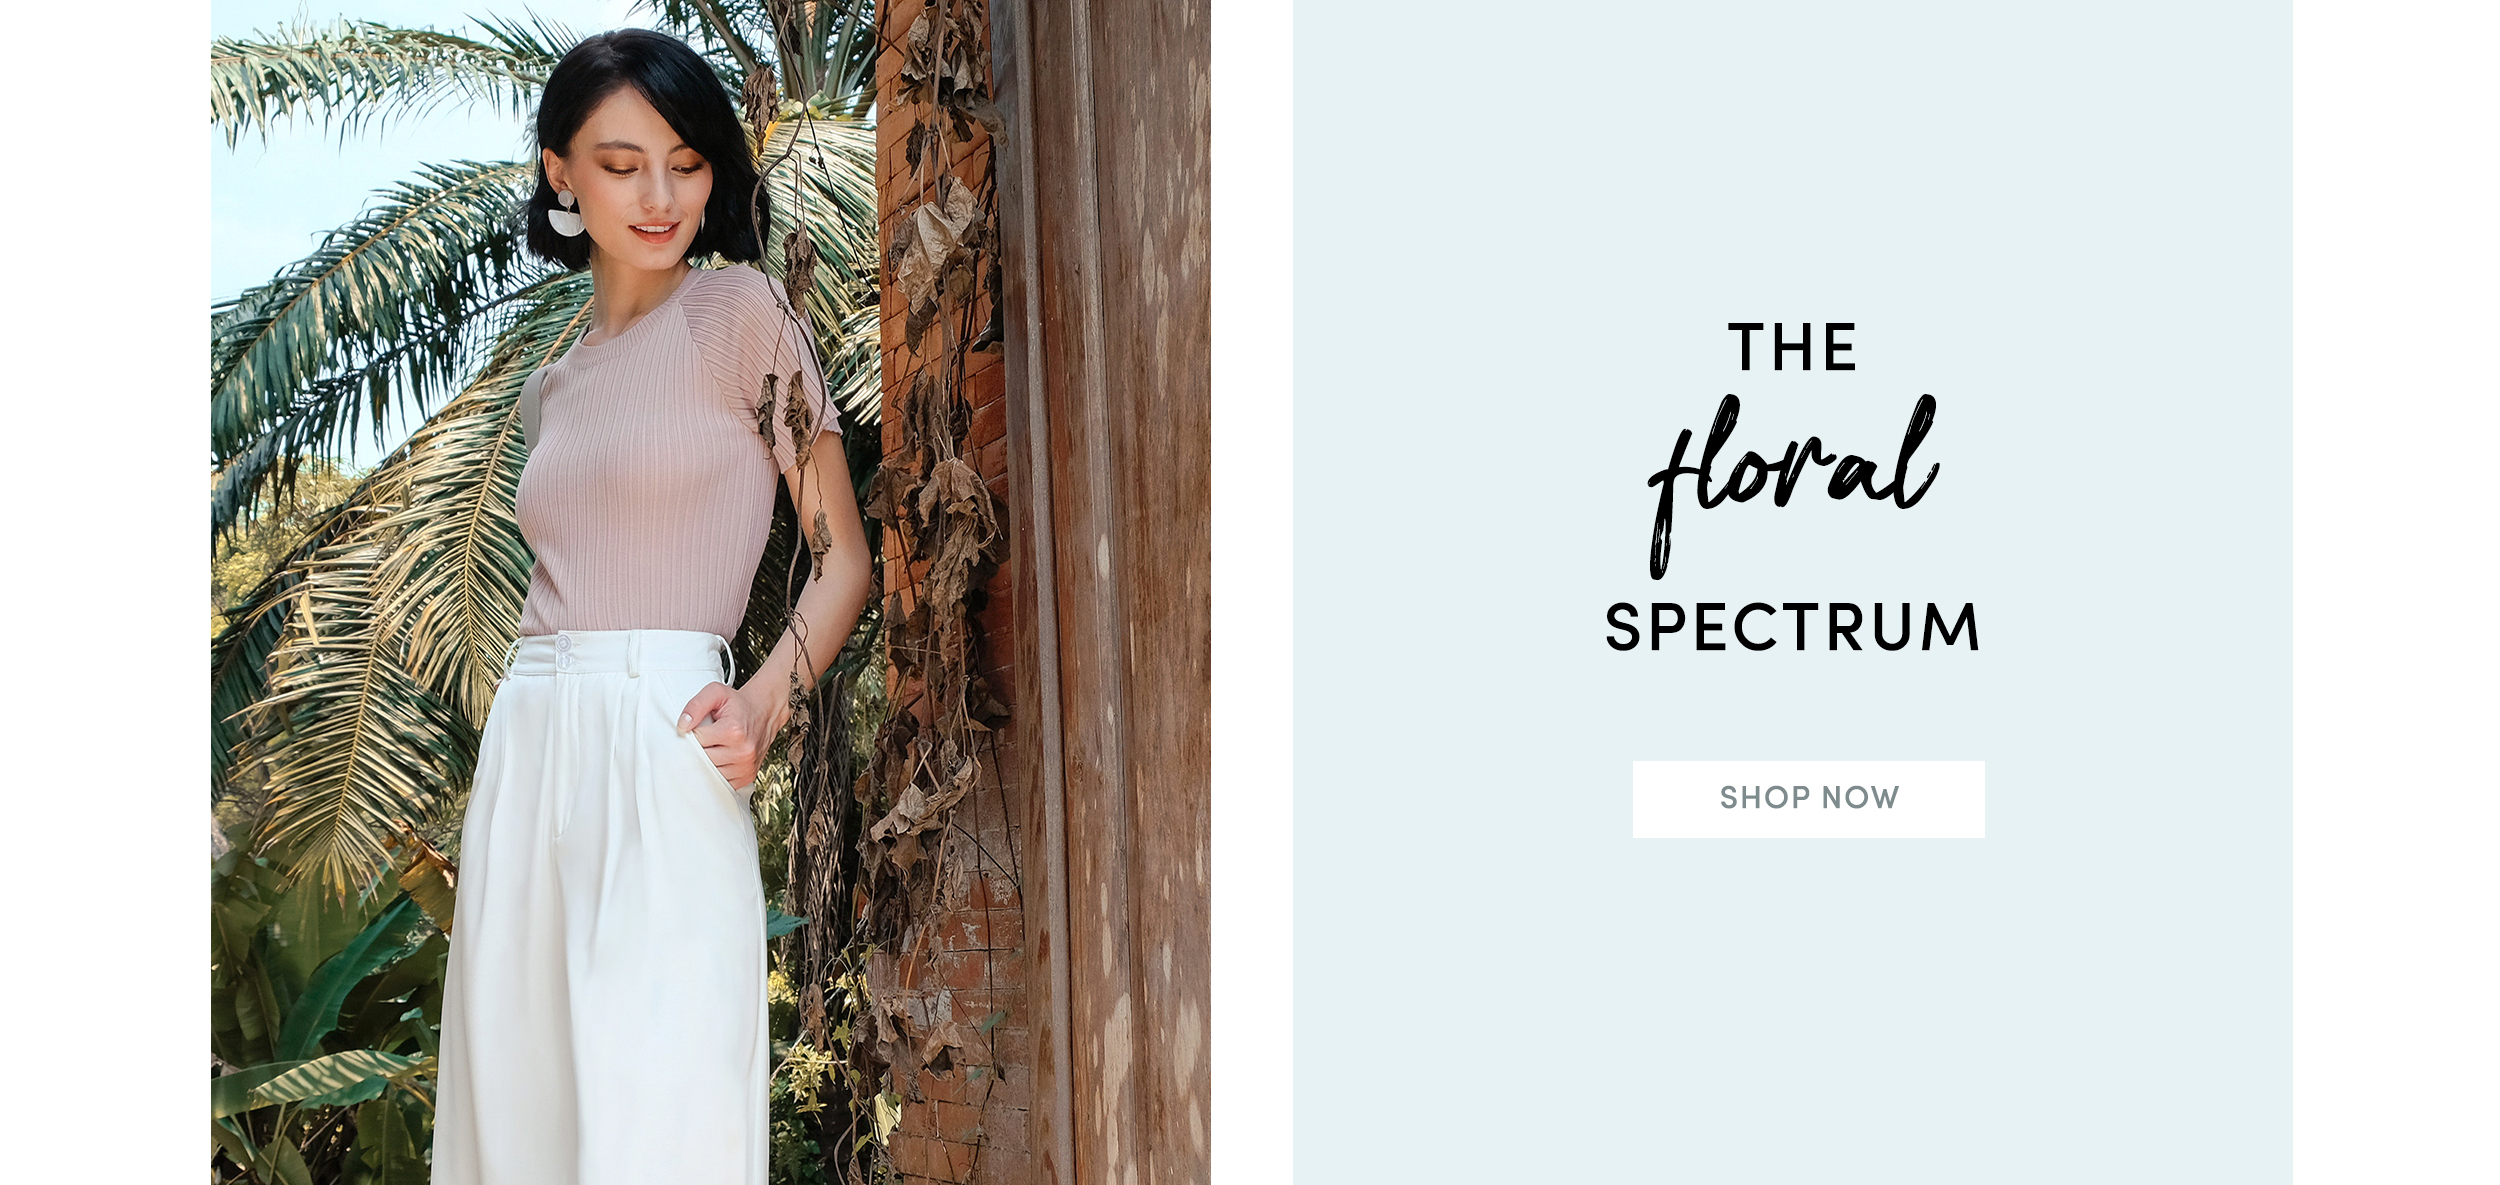 The Floral Spectrum